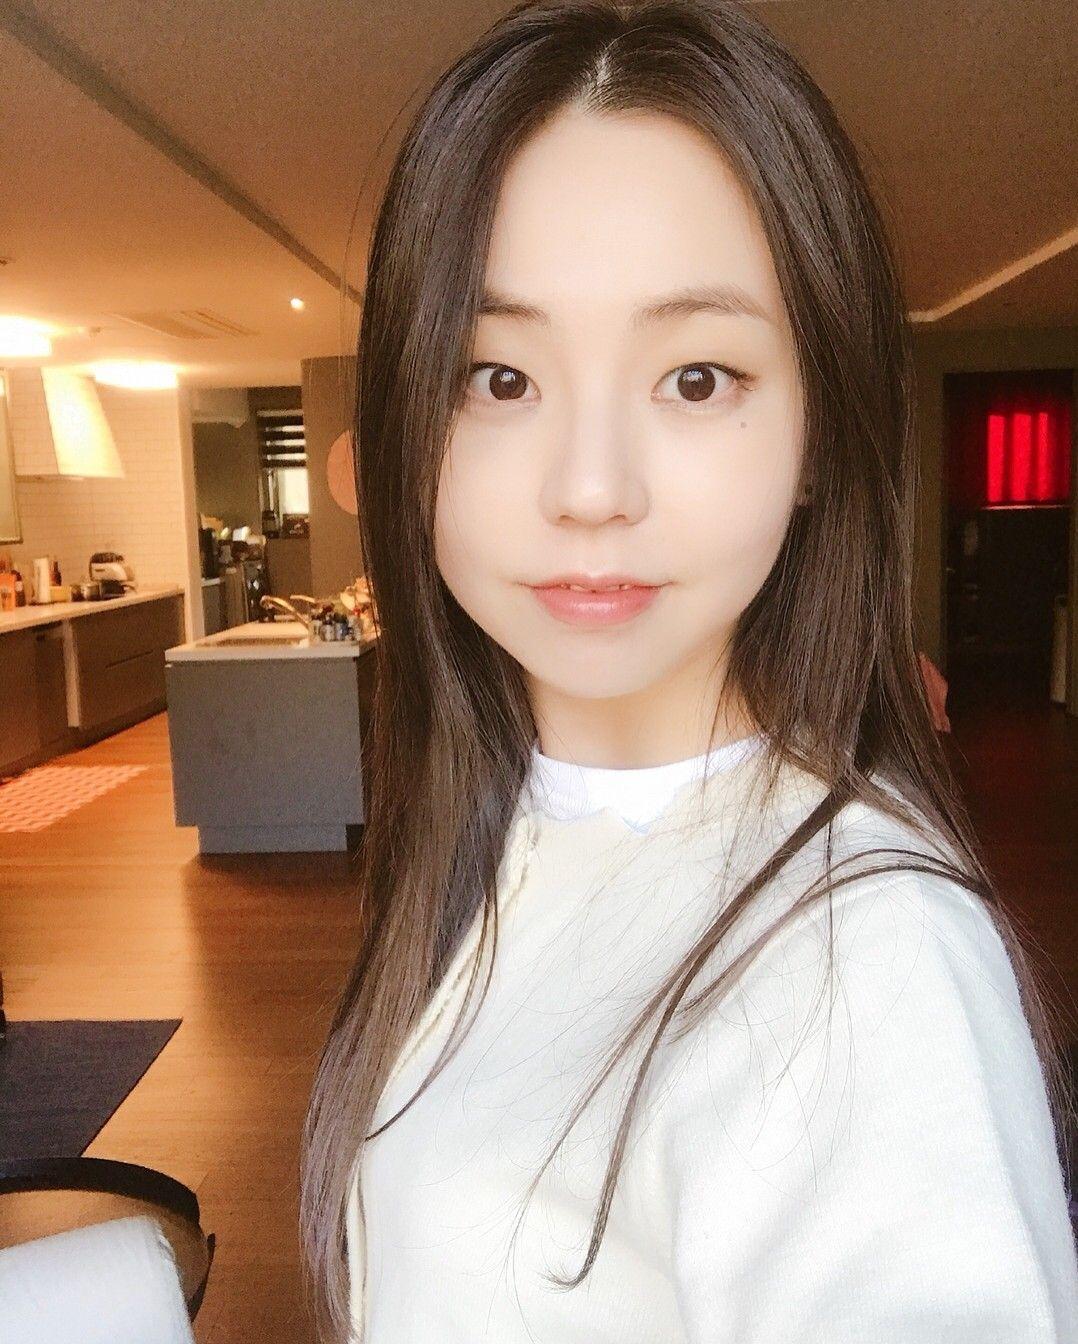 kpophqpictures:[CF] Ahn So Hee - Shu Uemura 1000x1600